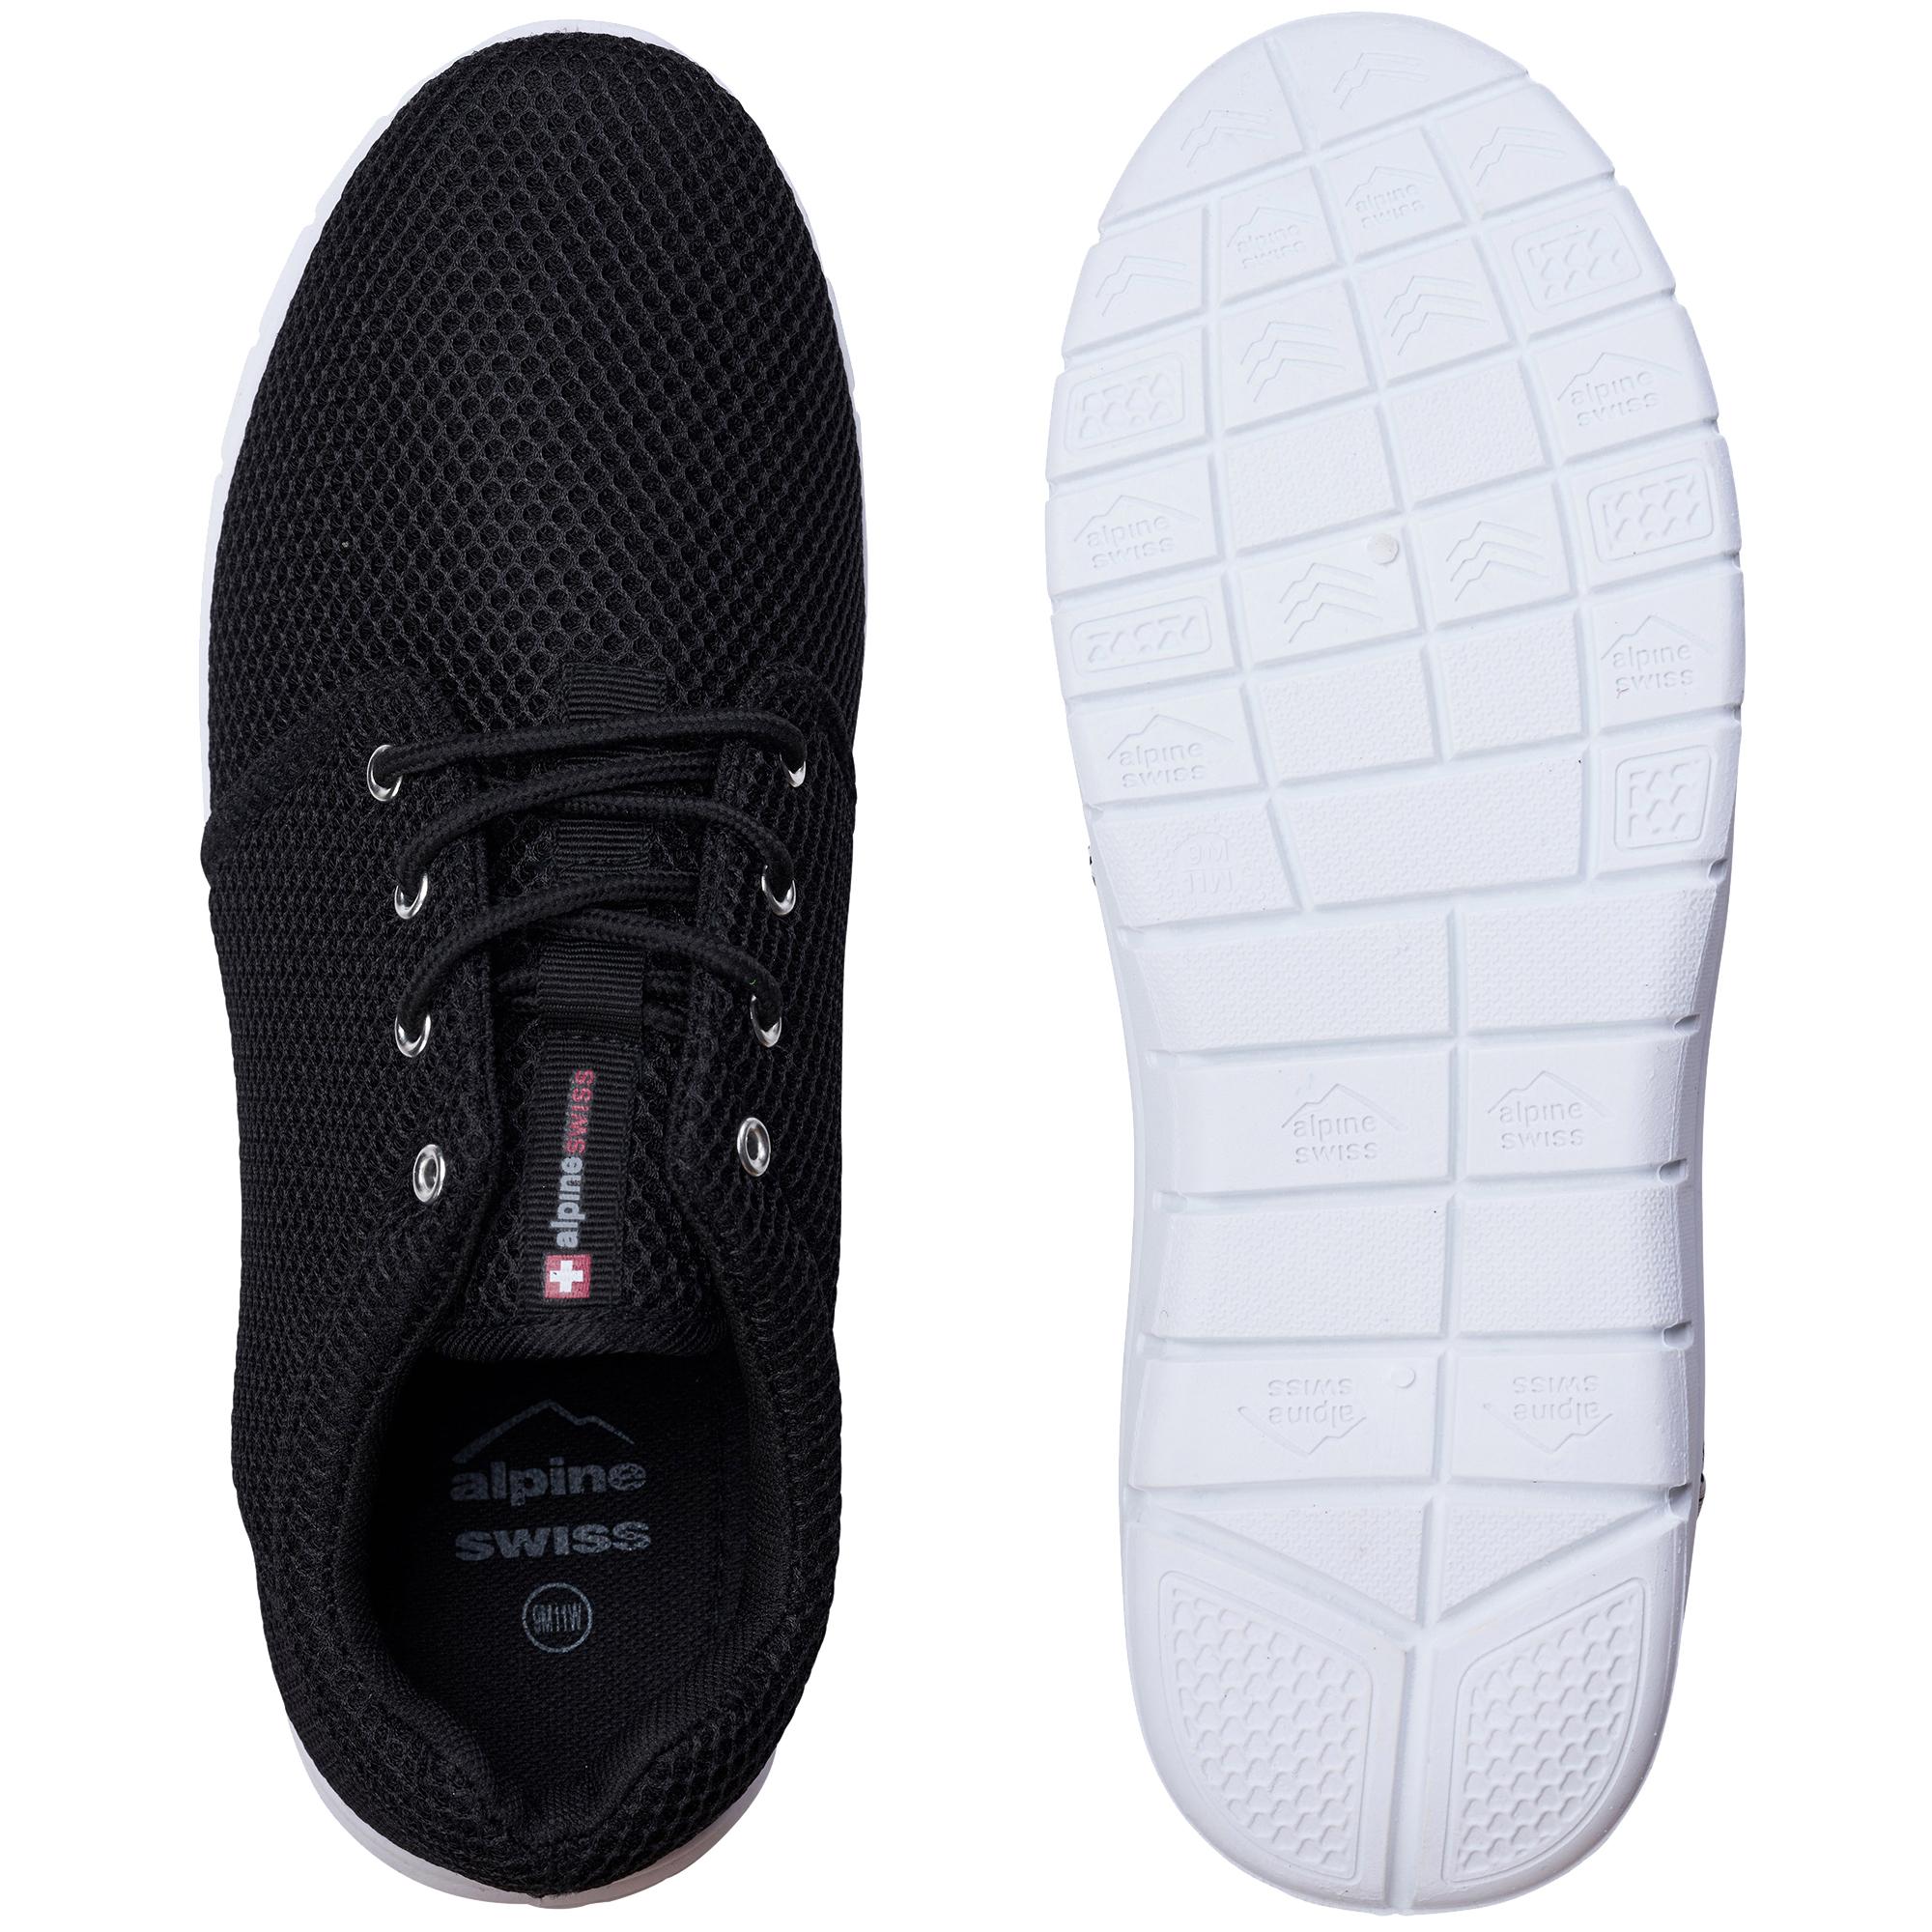 Alpine Swiss Kilian Mesh Sneakers Casual Shoes Mens /& Womens Lightweight Trainer